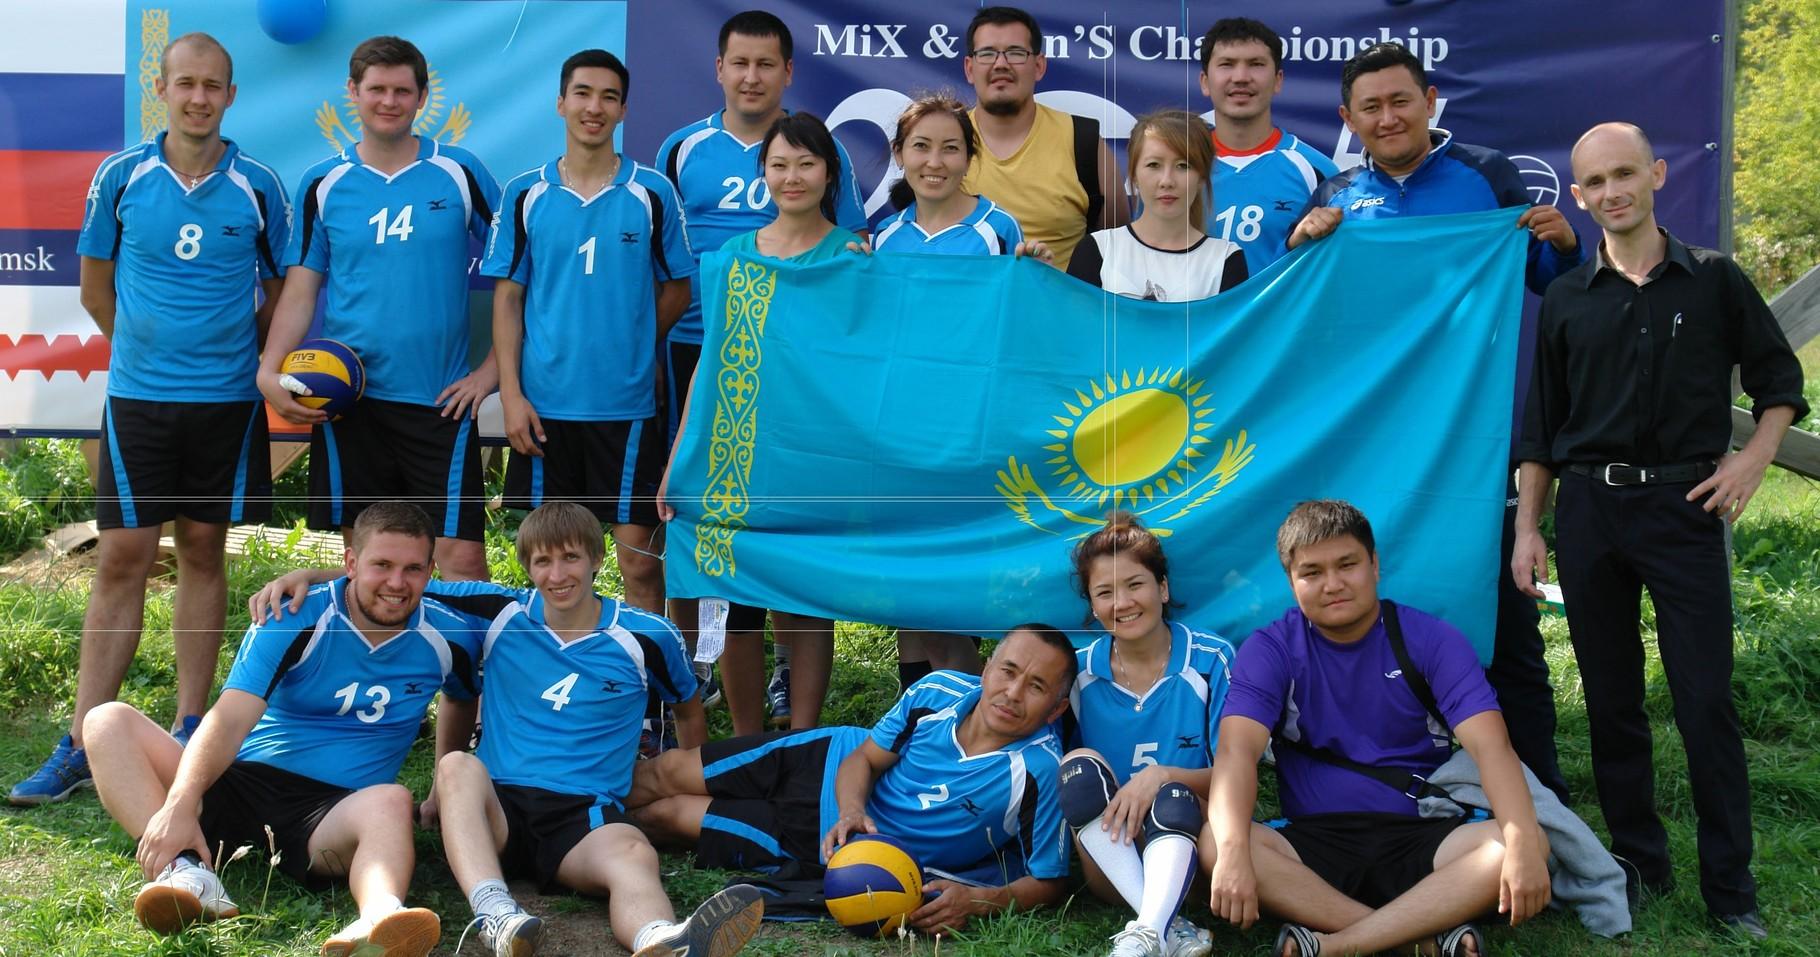 Чемпионат НВЛ 2015. Сборная НВЛ-Астана